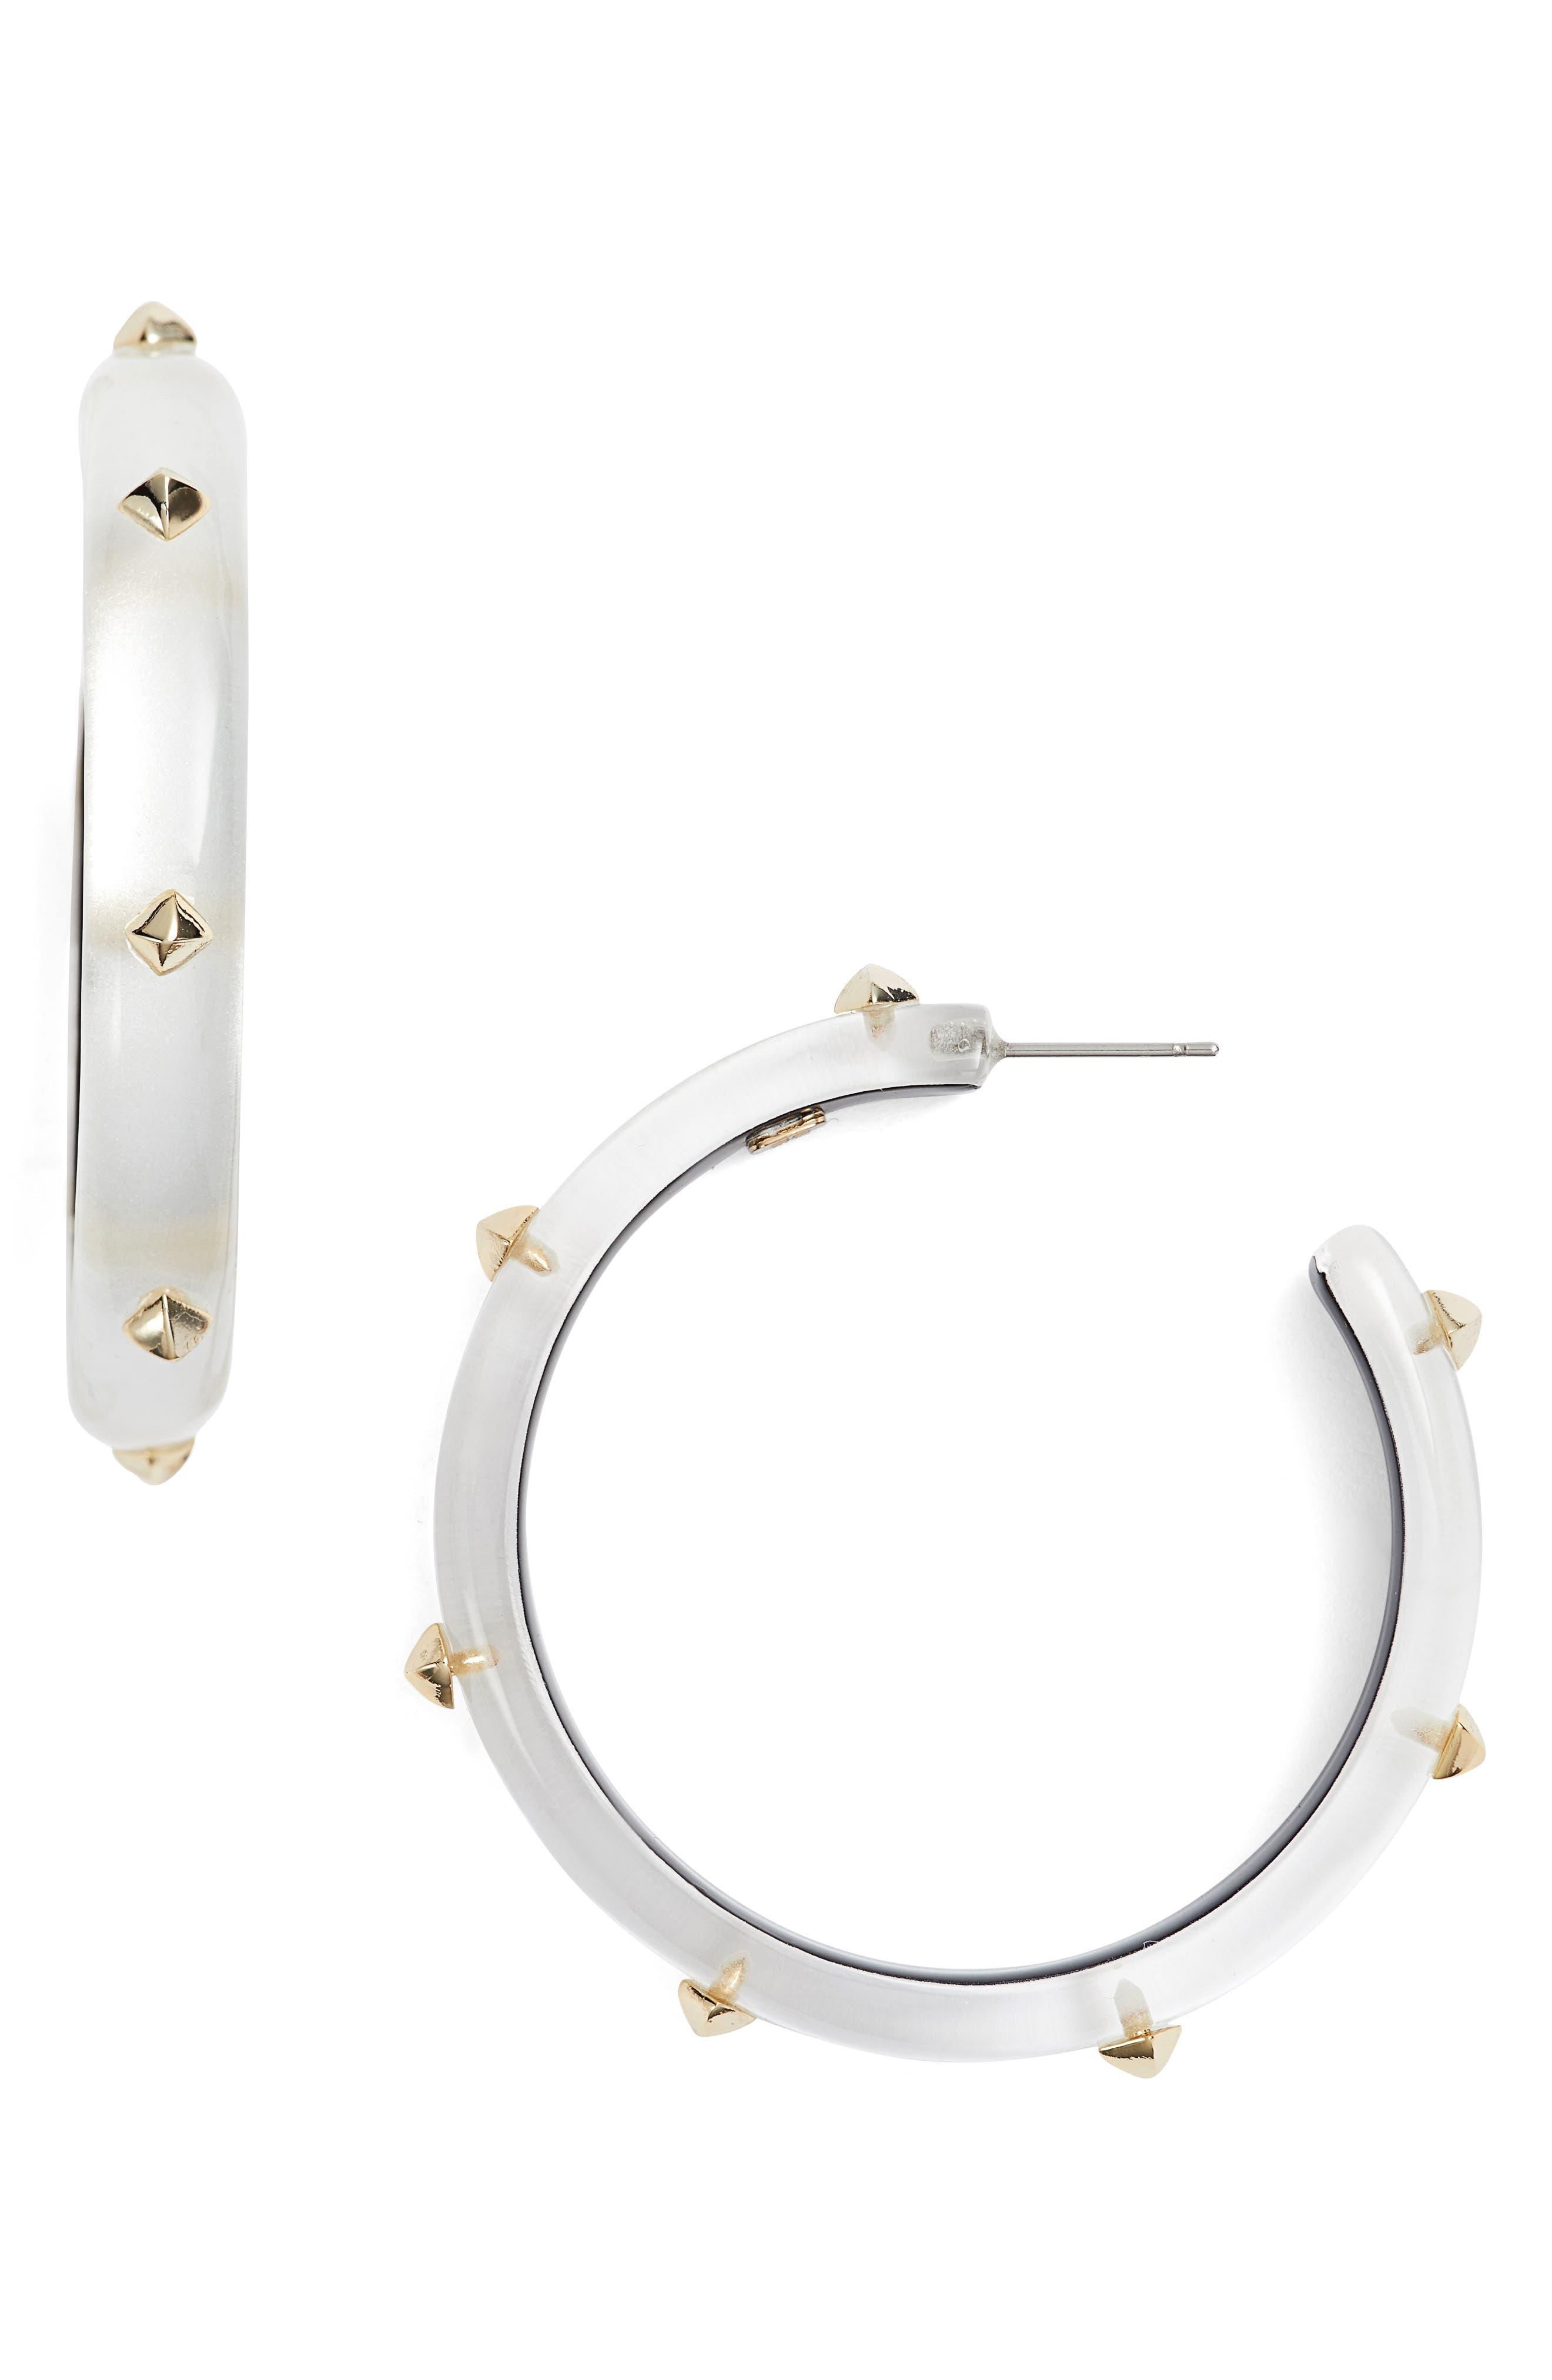 Alexis Bittar Studded Lucite® Hoop Earrings